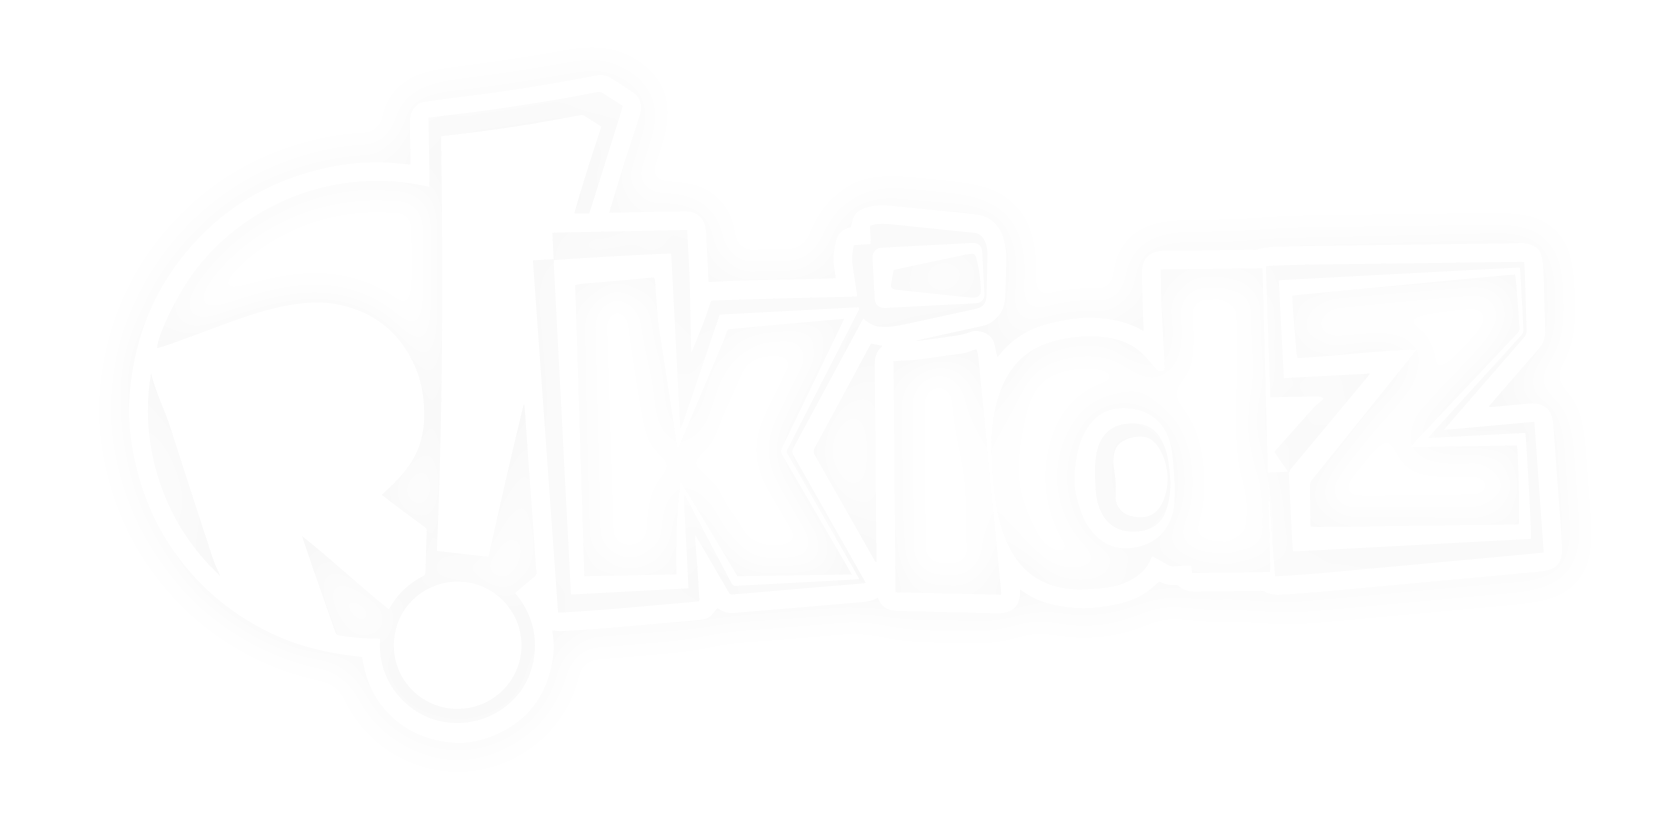 R!Kidz